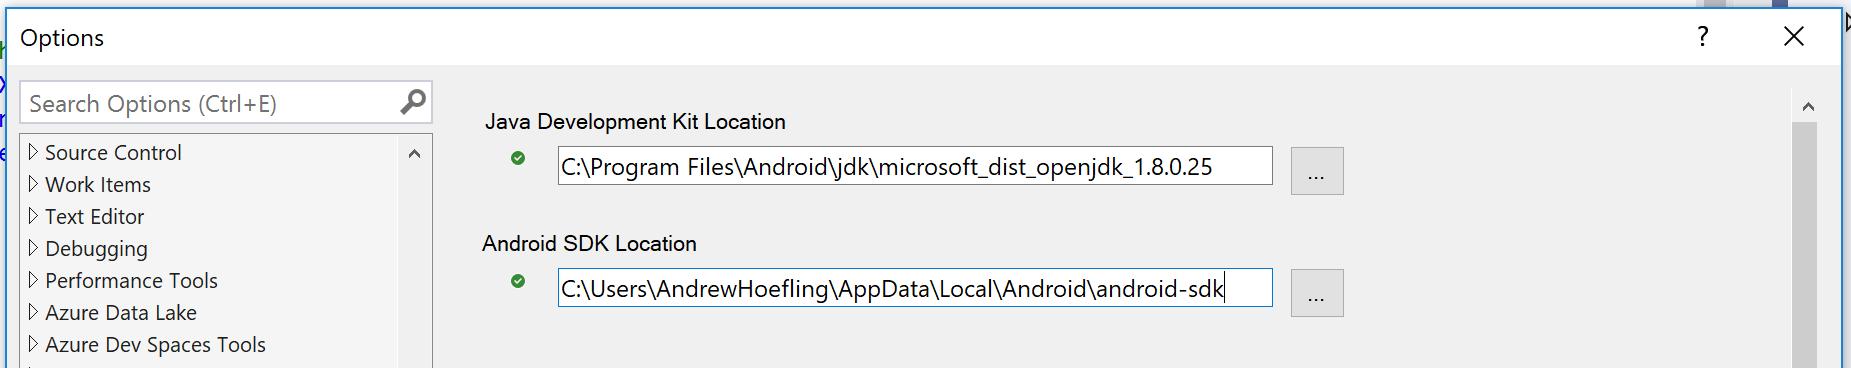 Troubleshooting JetBrains Rider and Visual Studio 2019